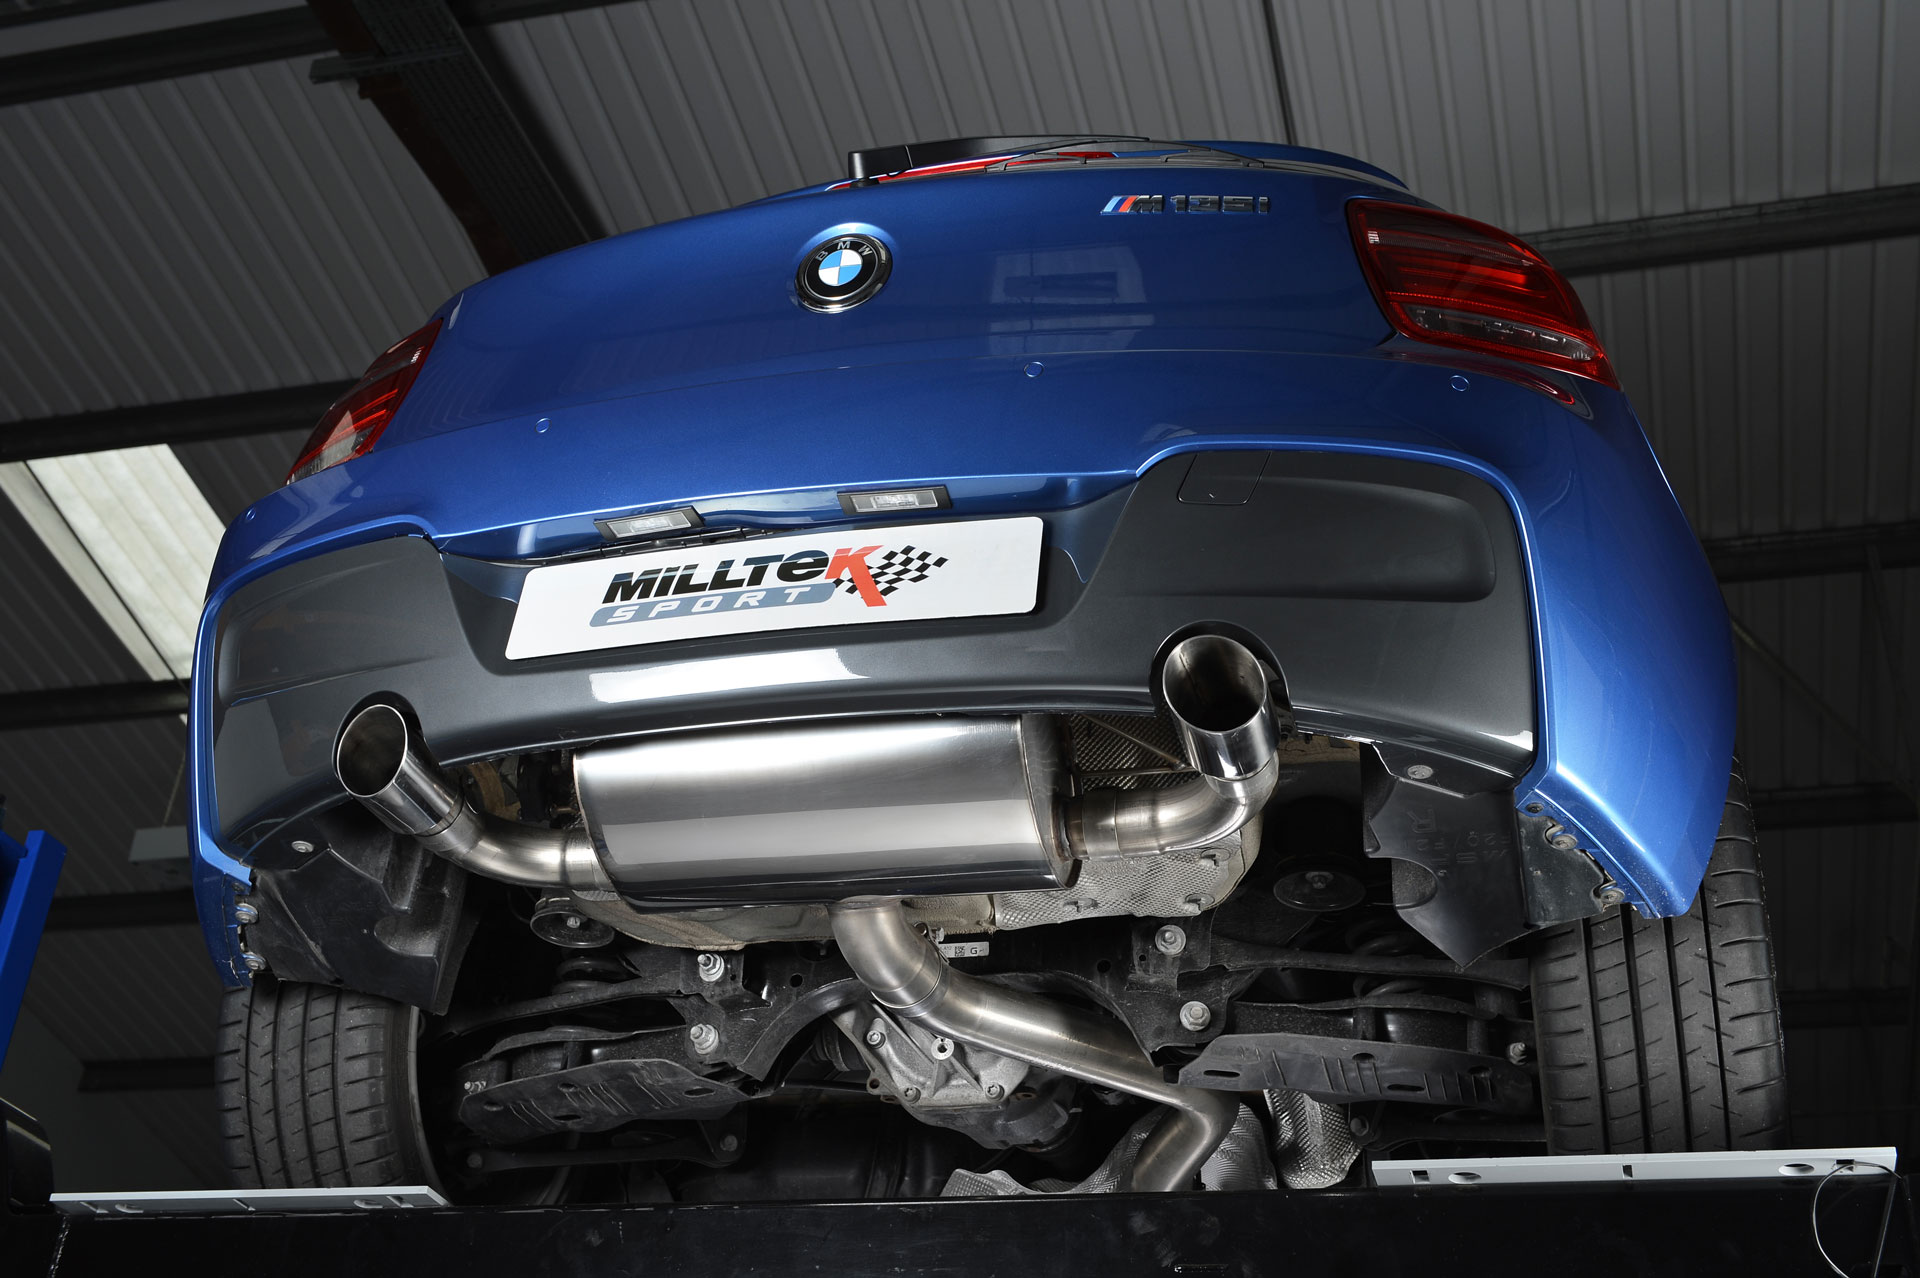 Milltek Performance Exhaust For Bmw M135i Brings Massive